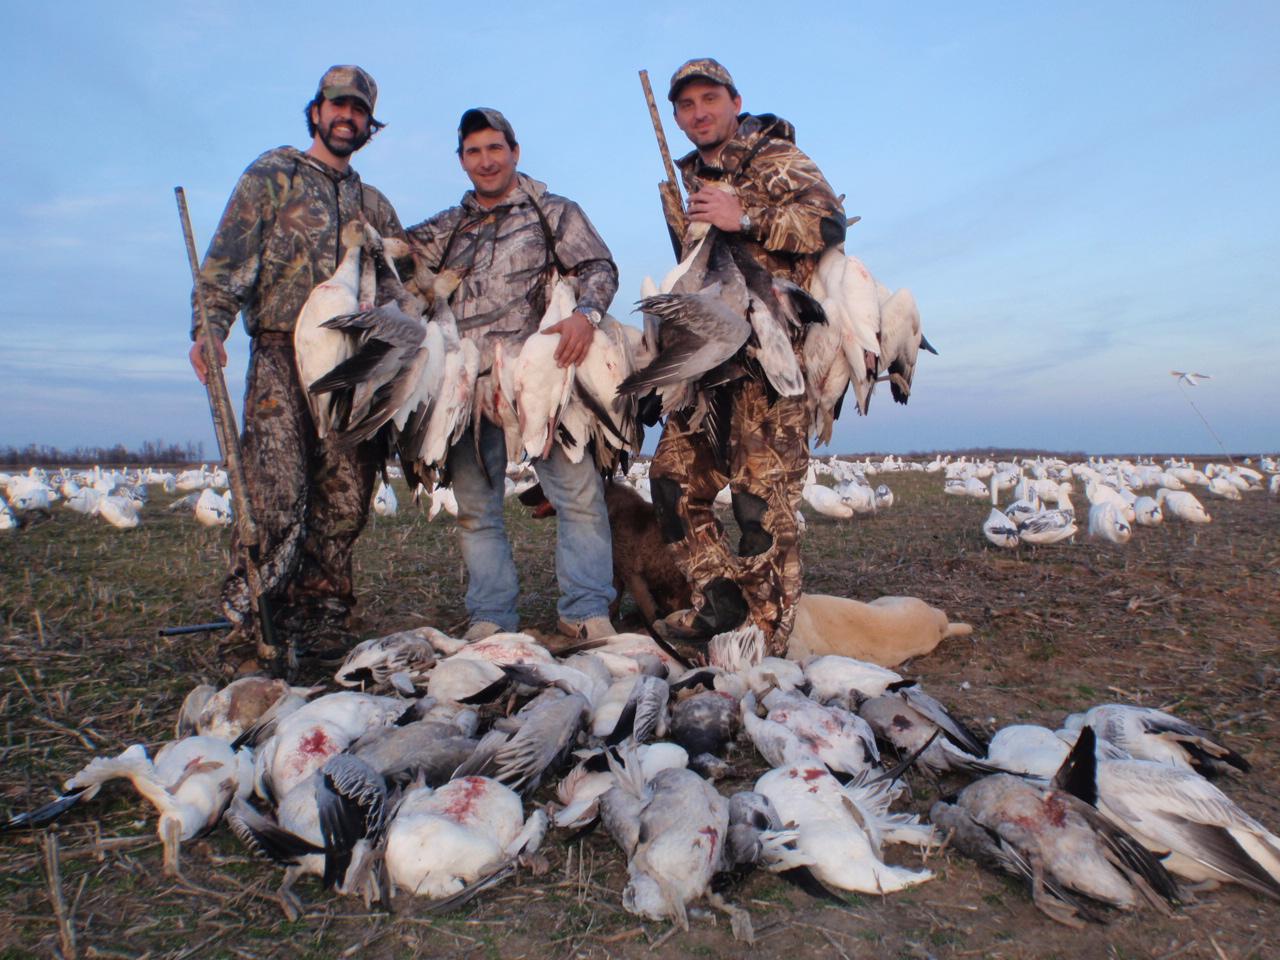 Snow goose pile